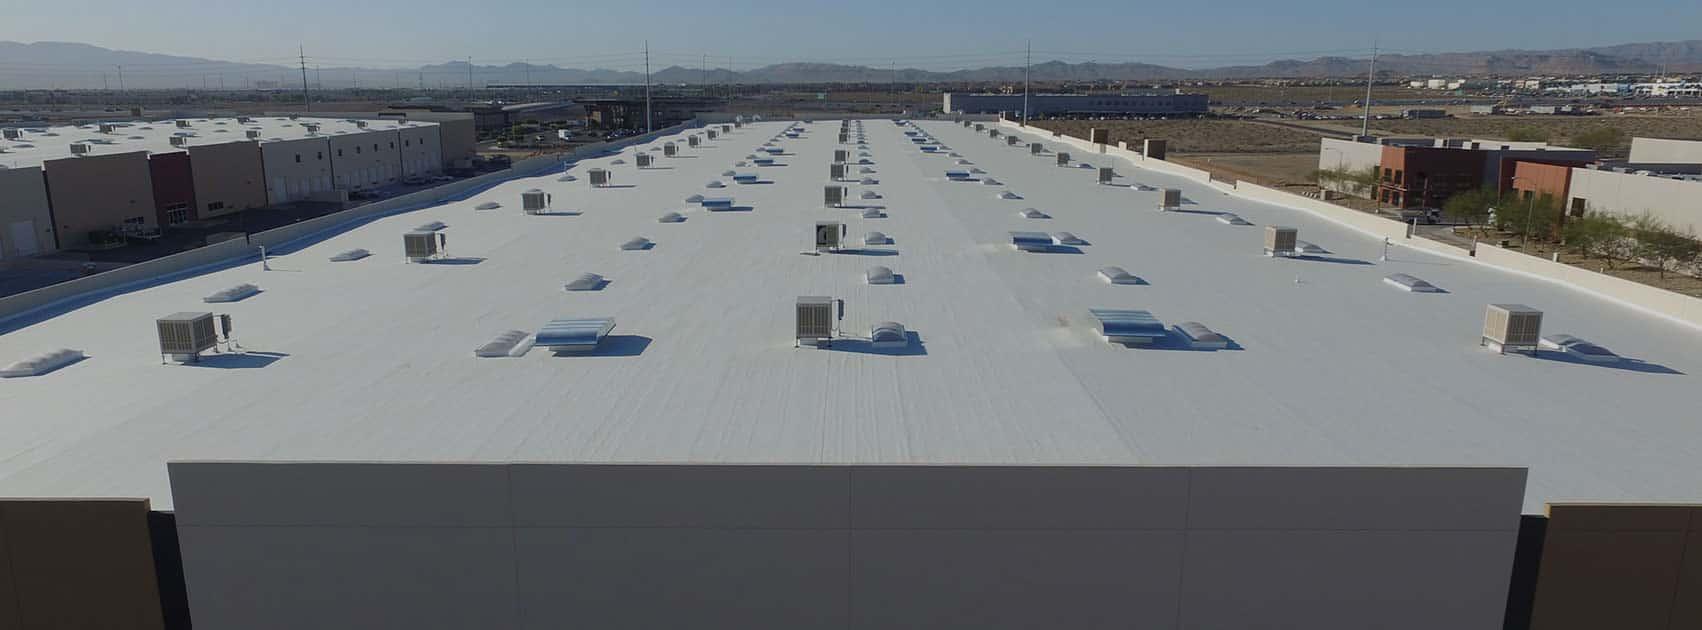 jones corp las vegas commercial roofing